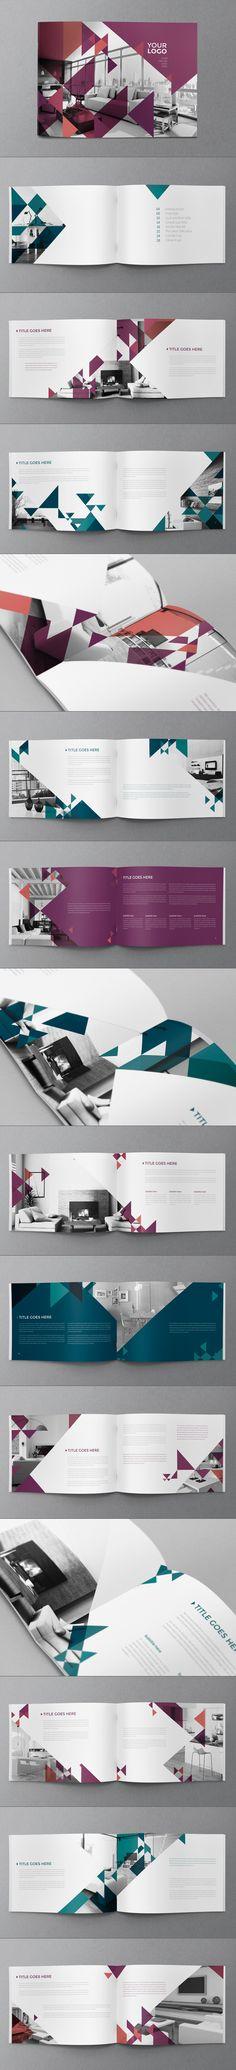 Modern Red Blue Brochure Design Template